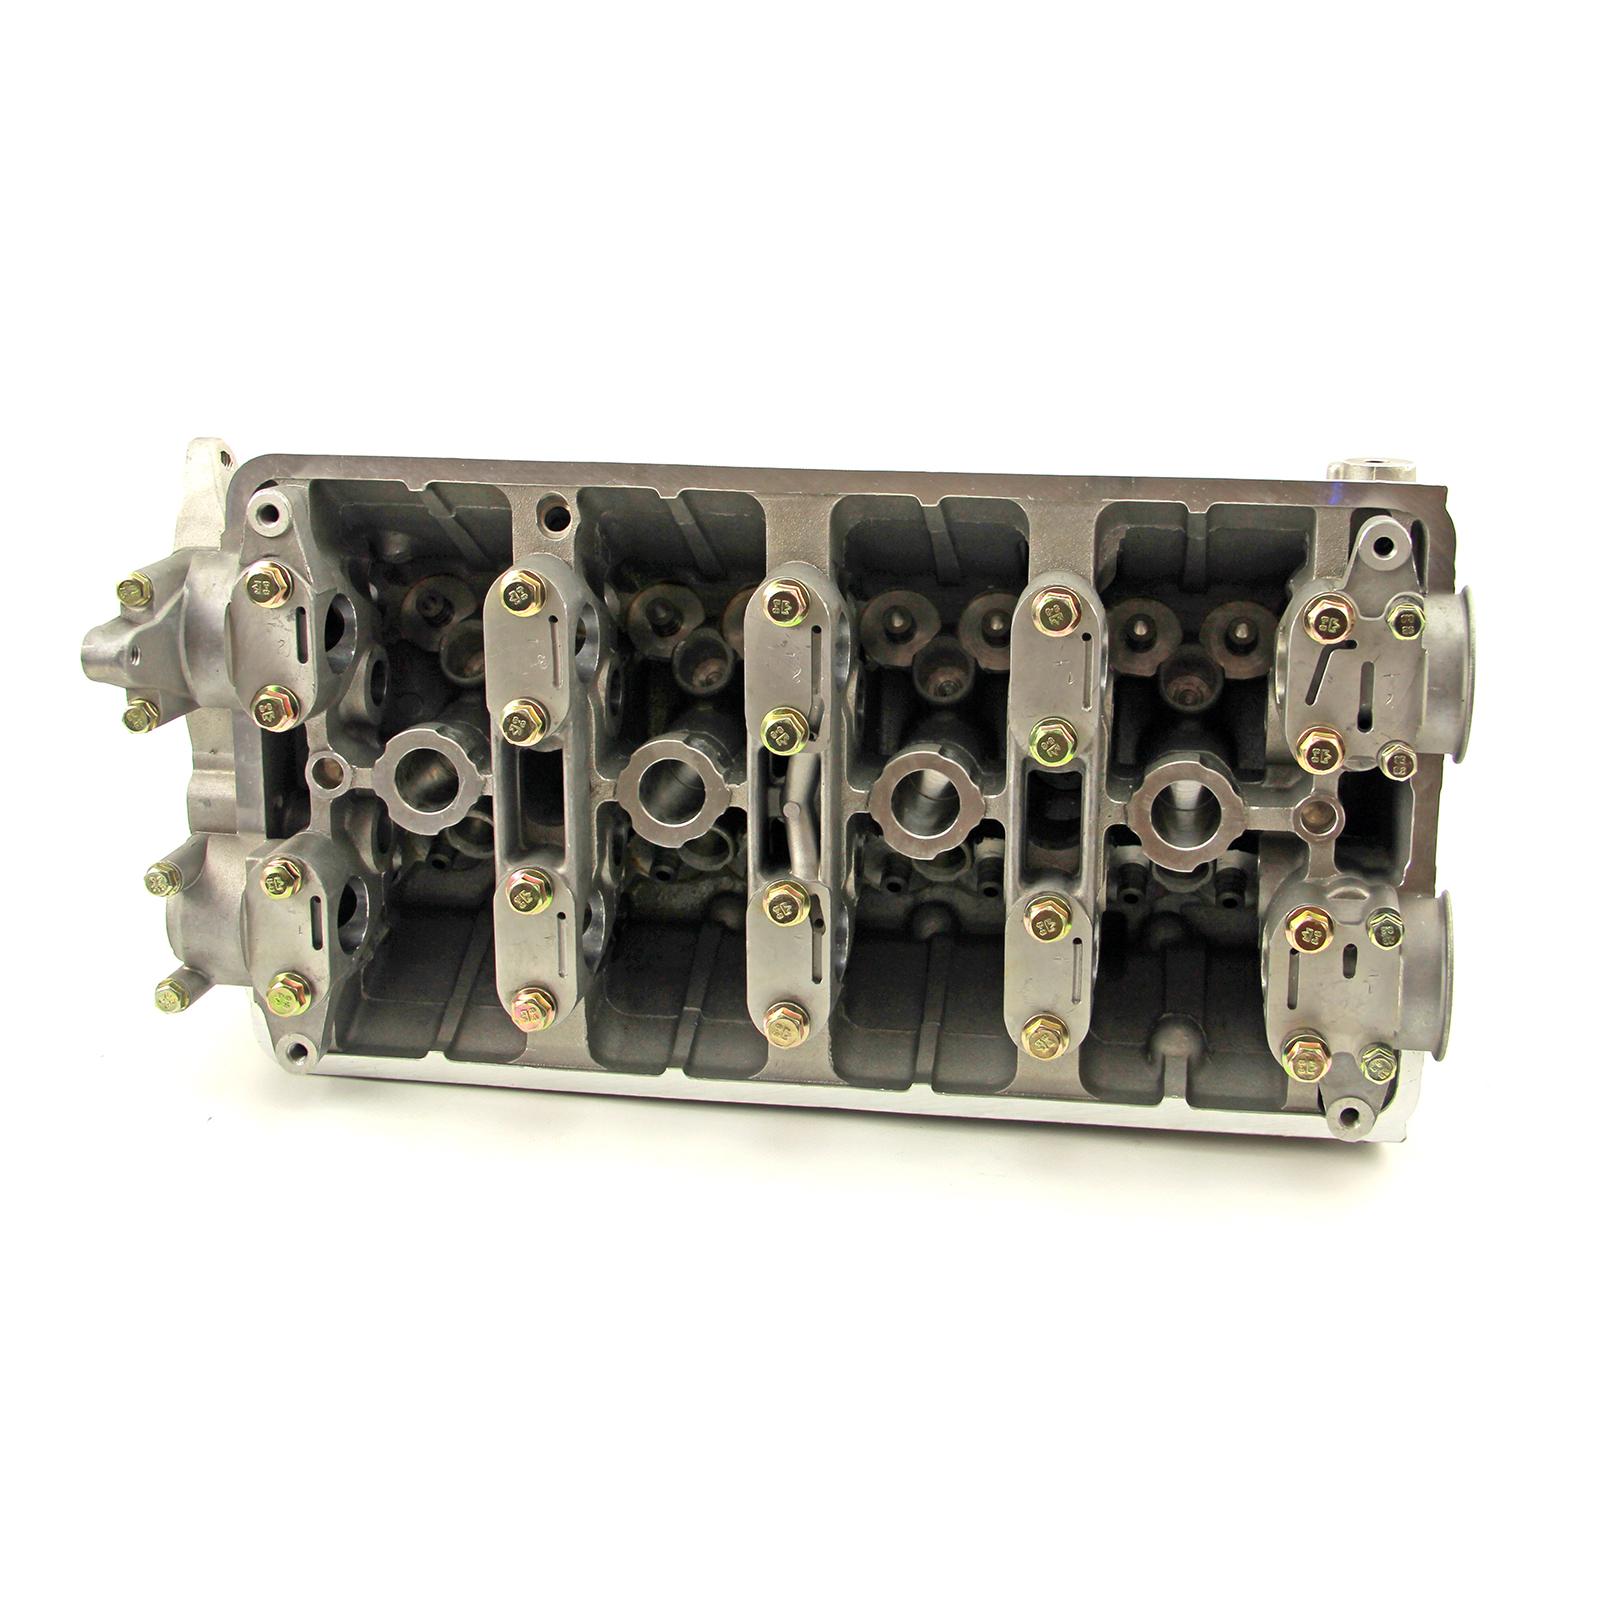 PCE® PCE281.1780 Fits Honda 4 Cyl B16A Vtec OEMcc Bare Aluminum Cylinder Head